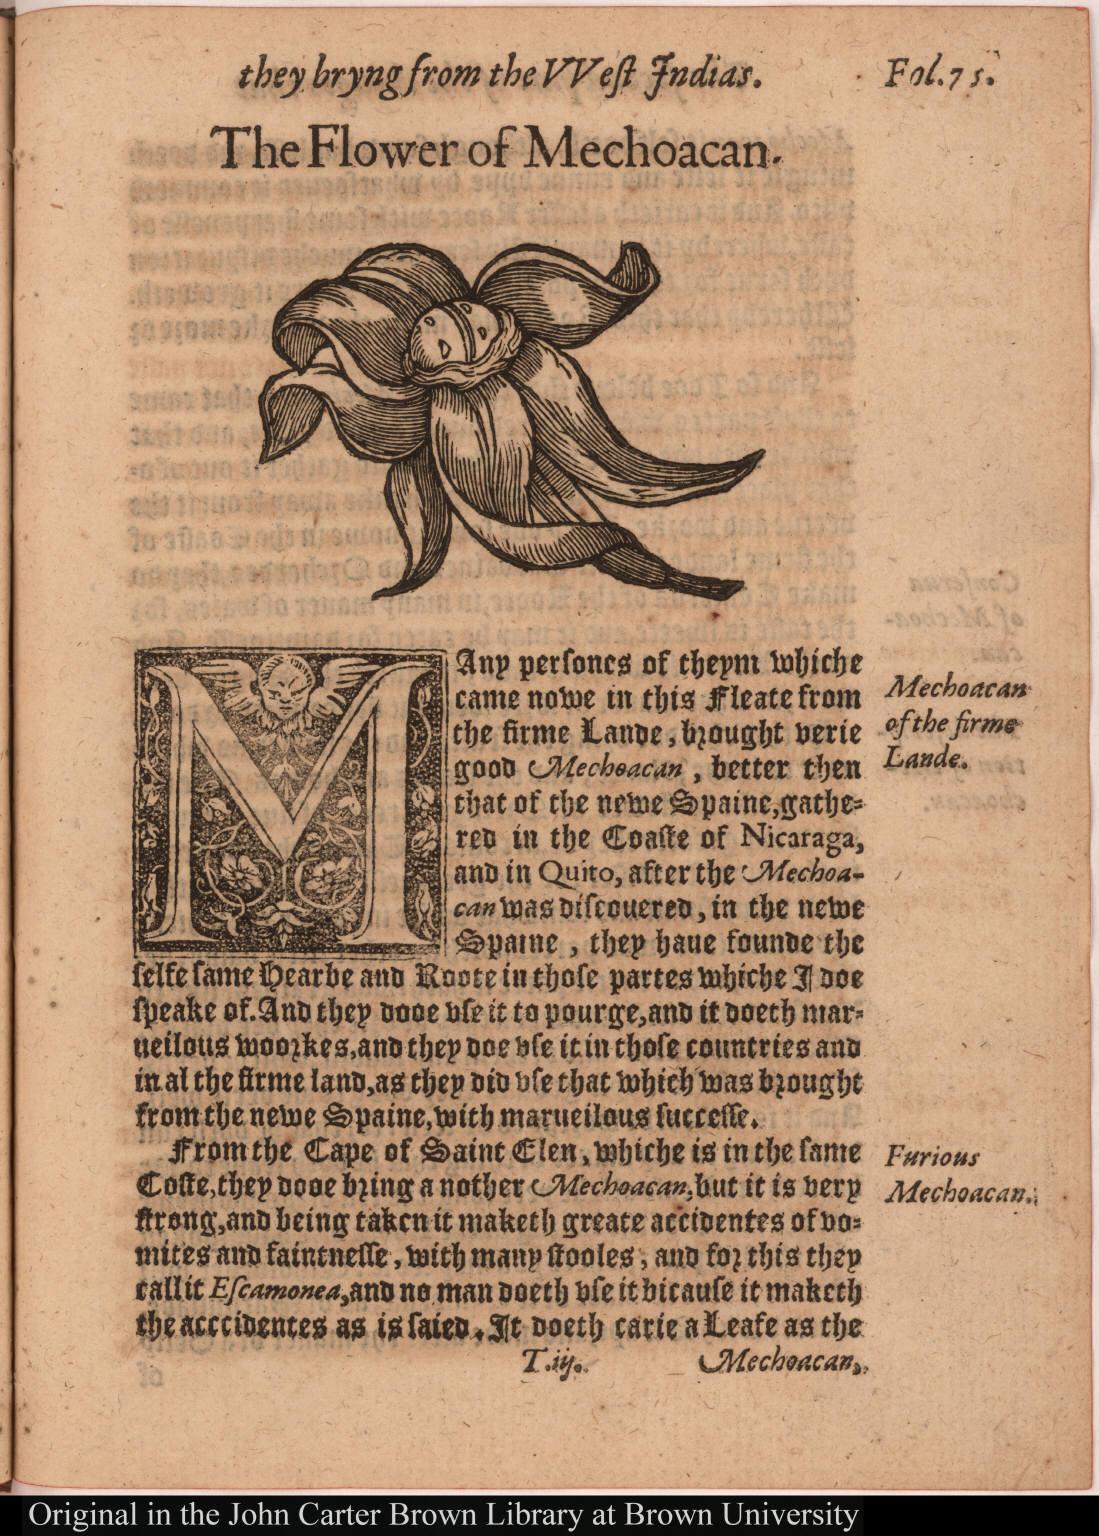 [The Flower of Mechoacan.]